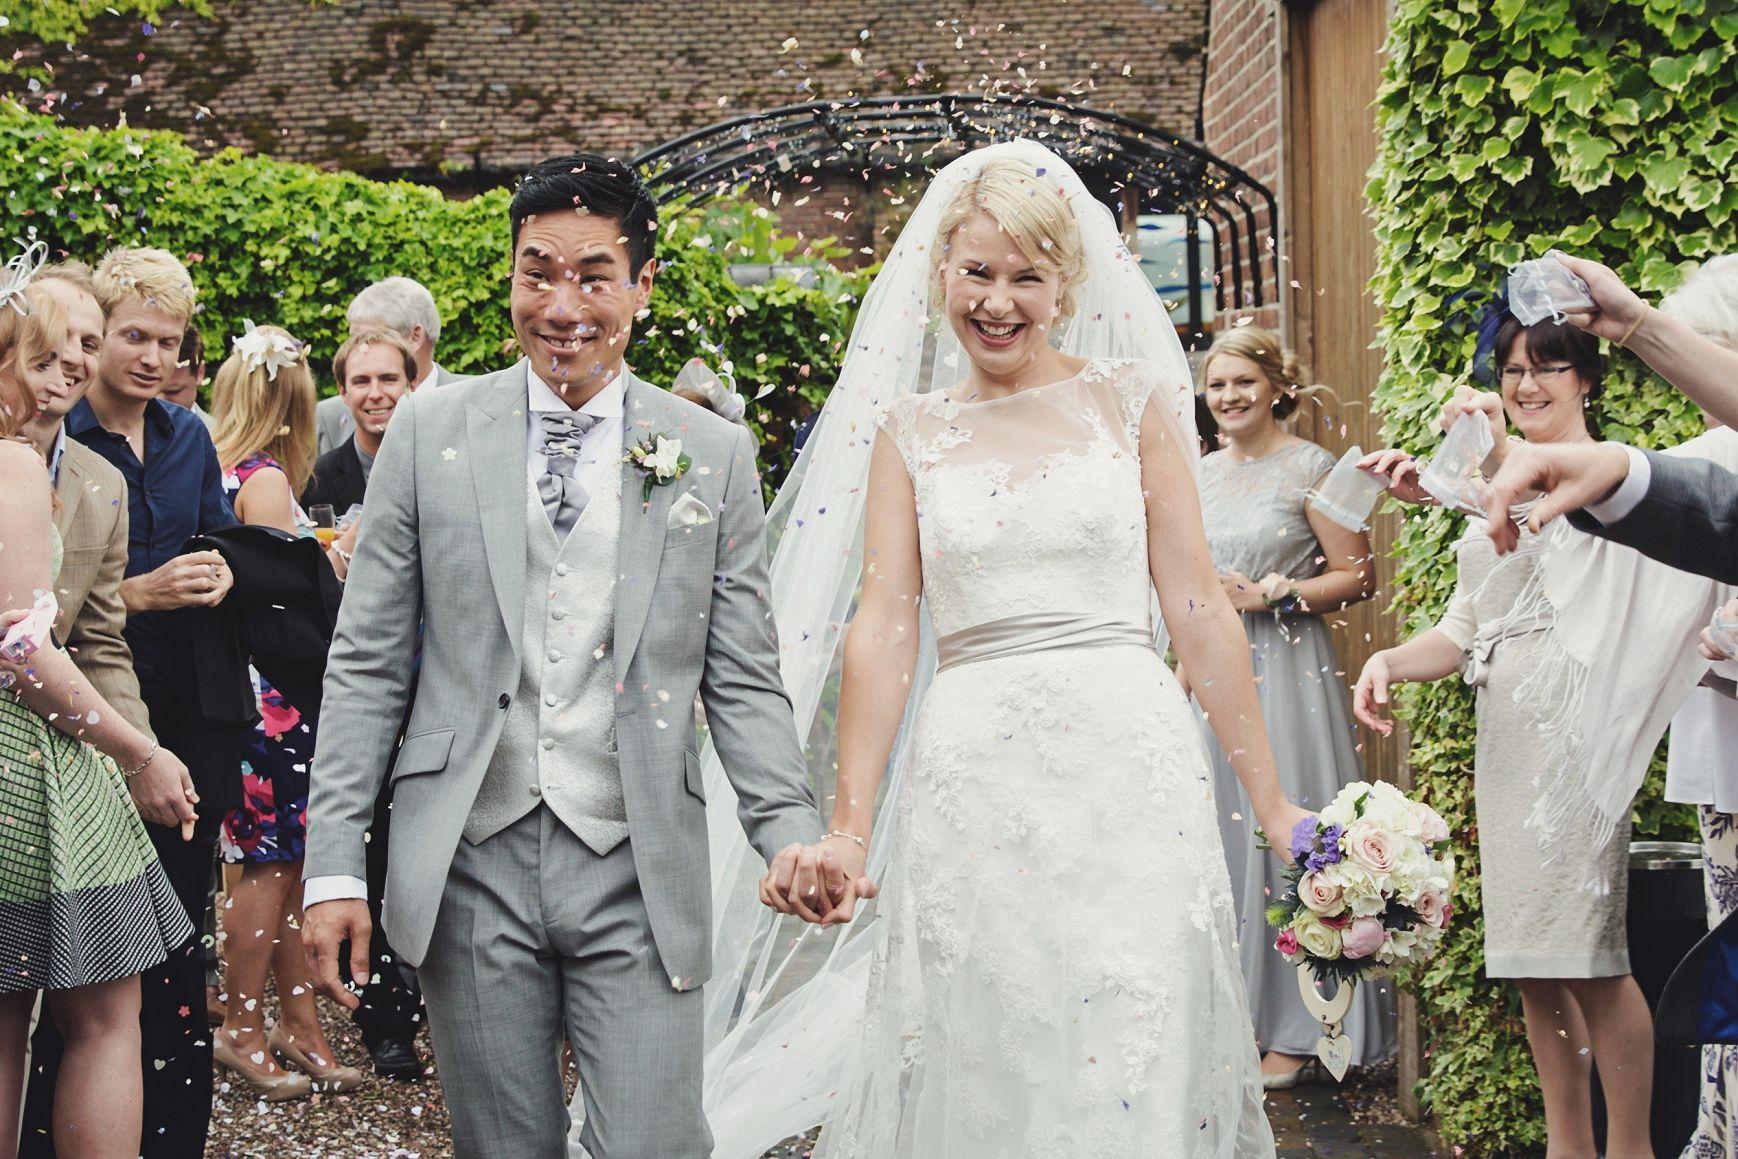 budget wedding photography west midlands%0A A Wedding in Shareshill  Corpus Christi Wedding Photographers  Linzi  u      Dean   Weddings   Pinterest   Corpus christi and Wedding